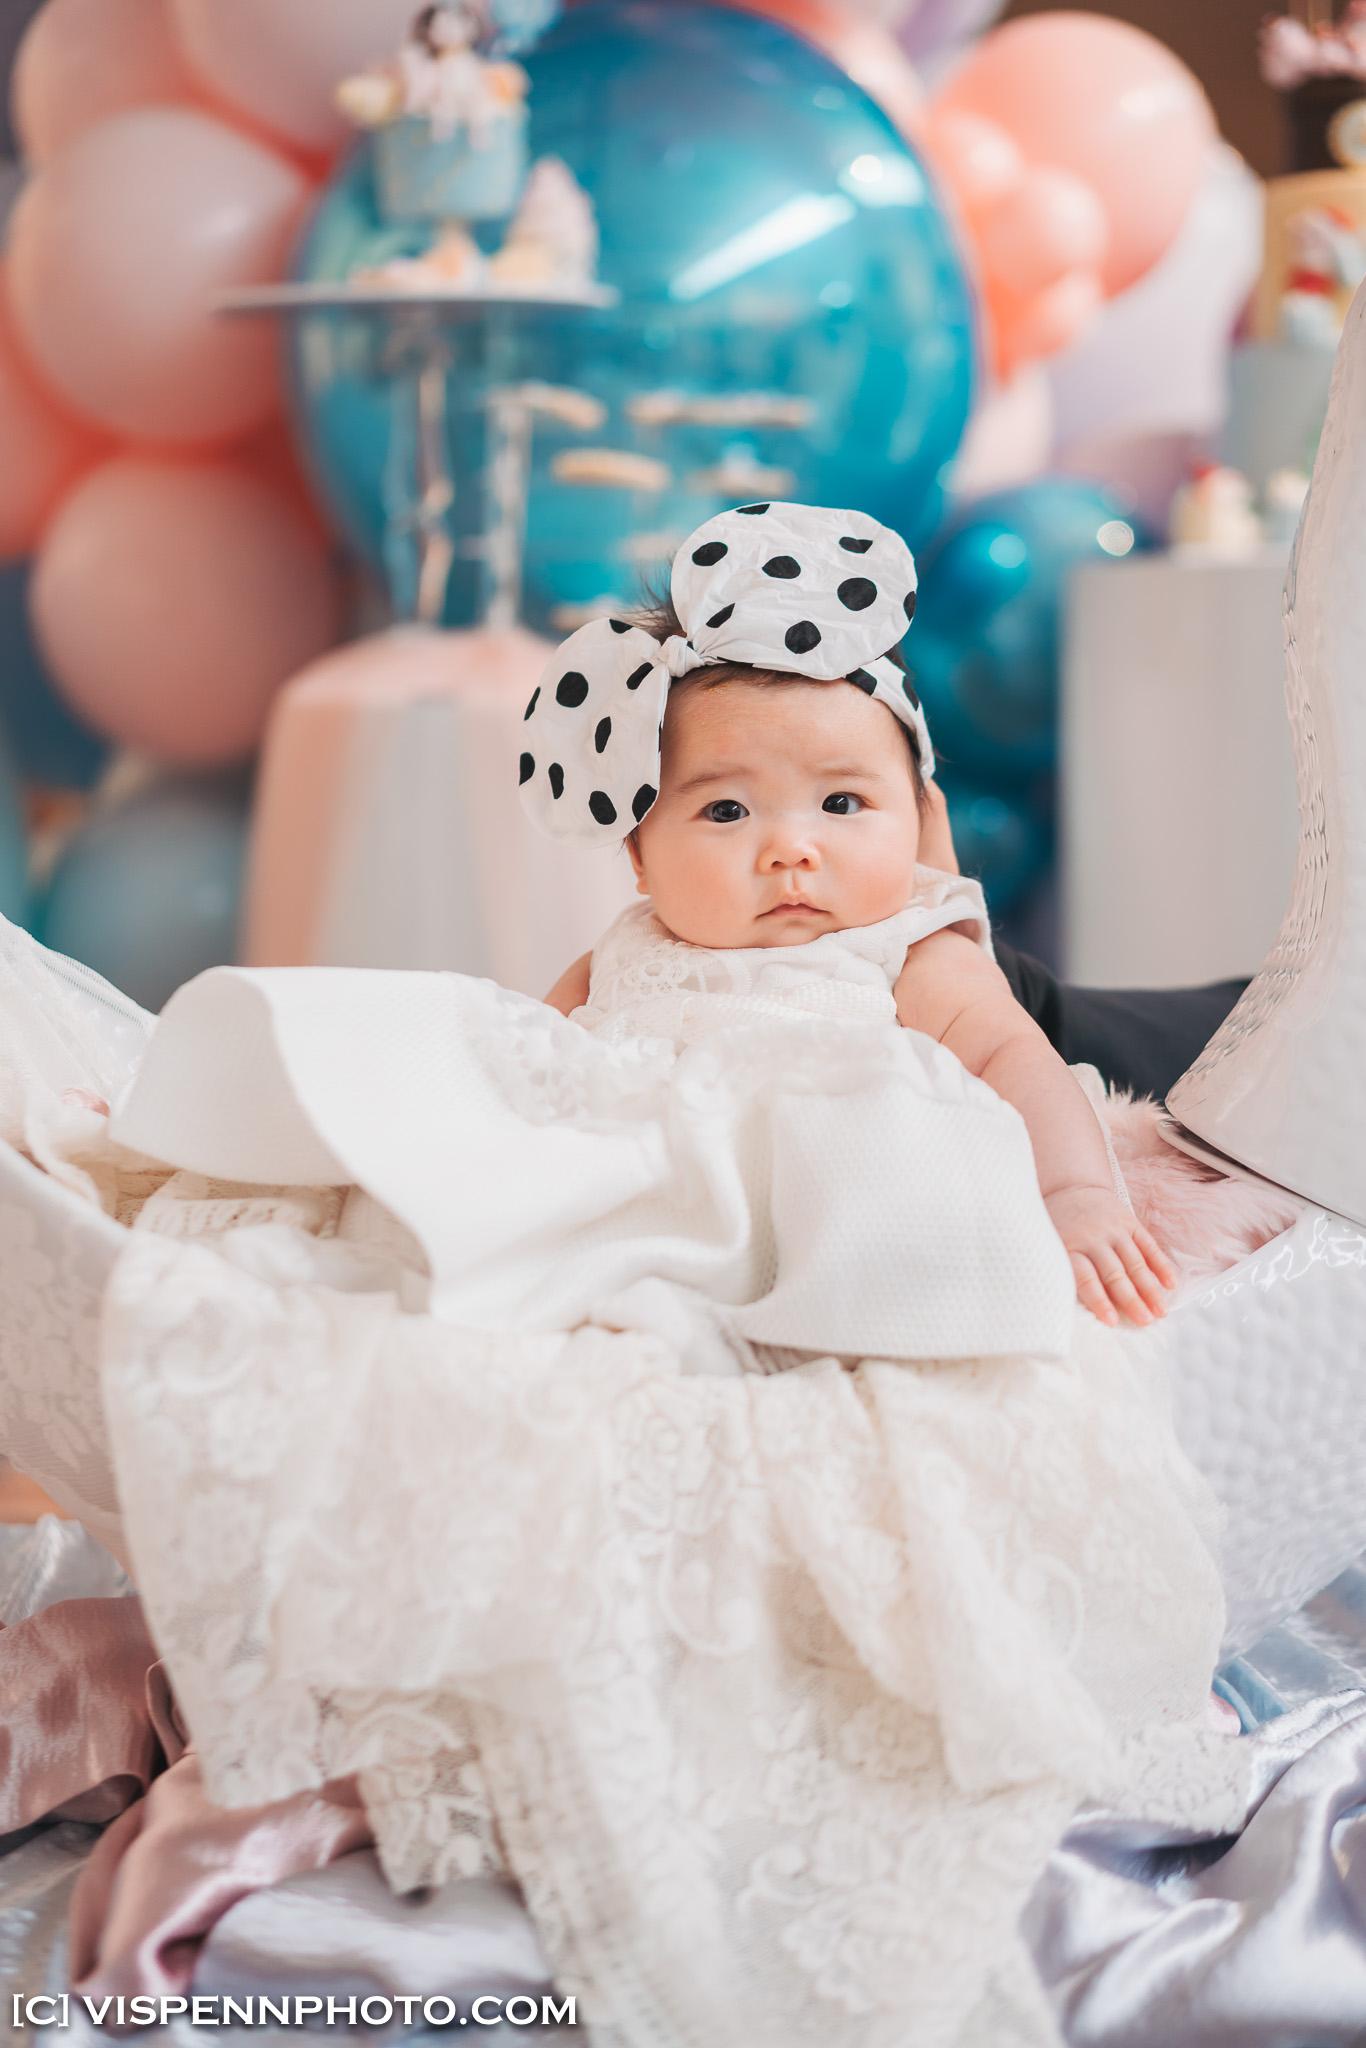 Melbourne Baby Family Birthday Party Photographer 墨尔本 百日宴 满月宴 周岁宴 摄影 VISPENN 100 Days 1253 Sony VISPENN